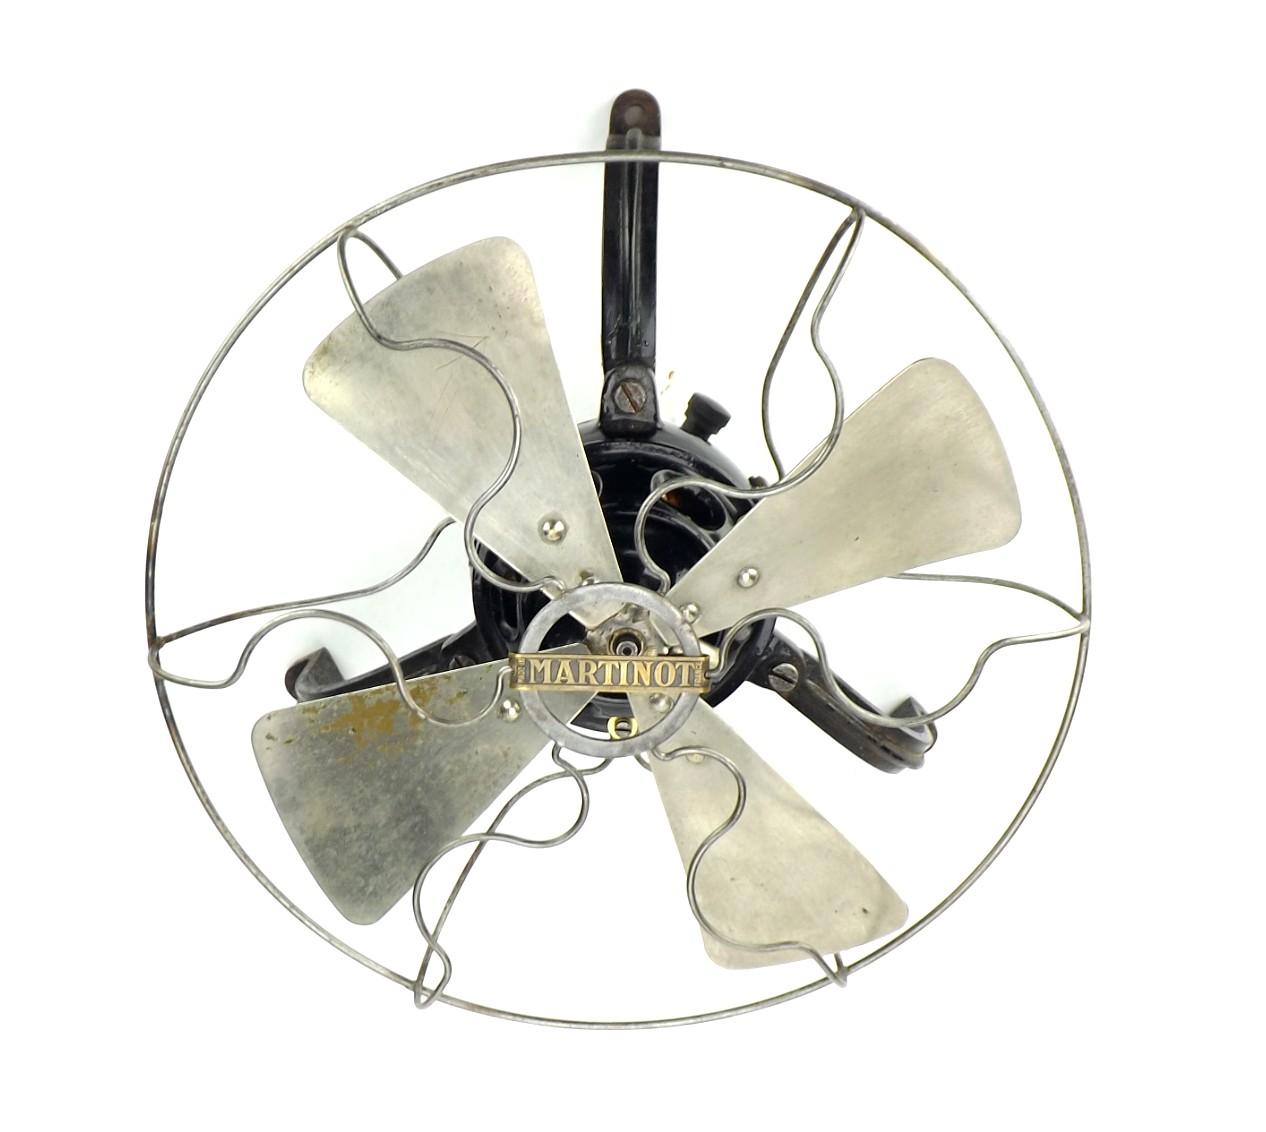 "Circa 1910 10"" Martinot Ceiling Fan Badged Thomson Houston Paris"